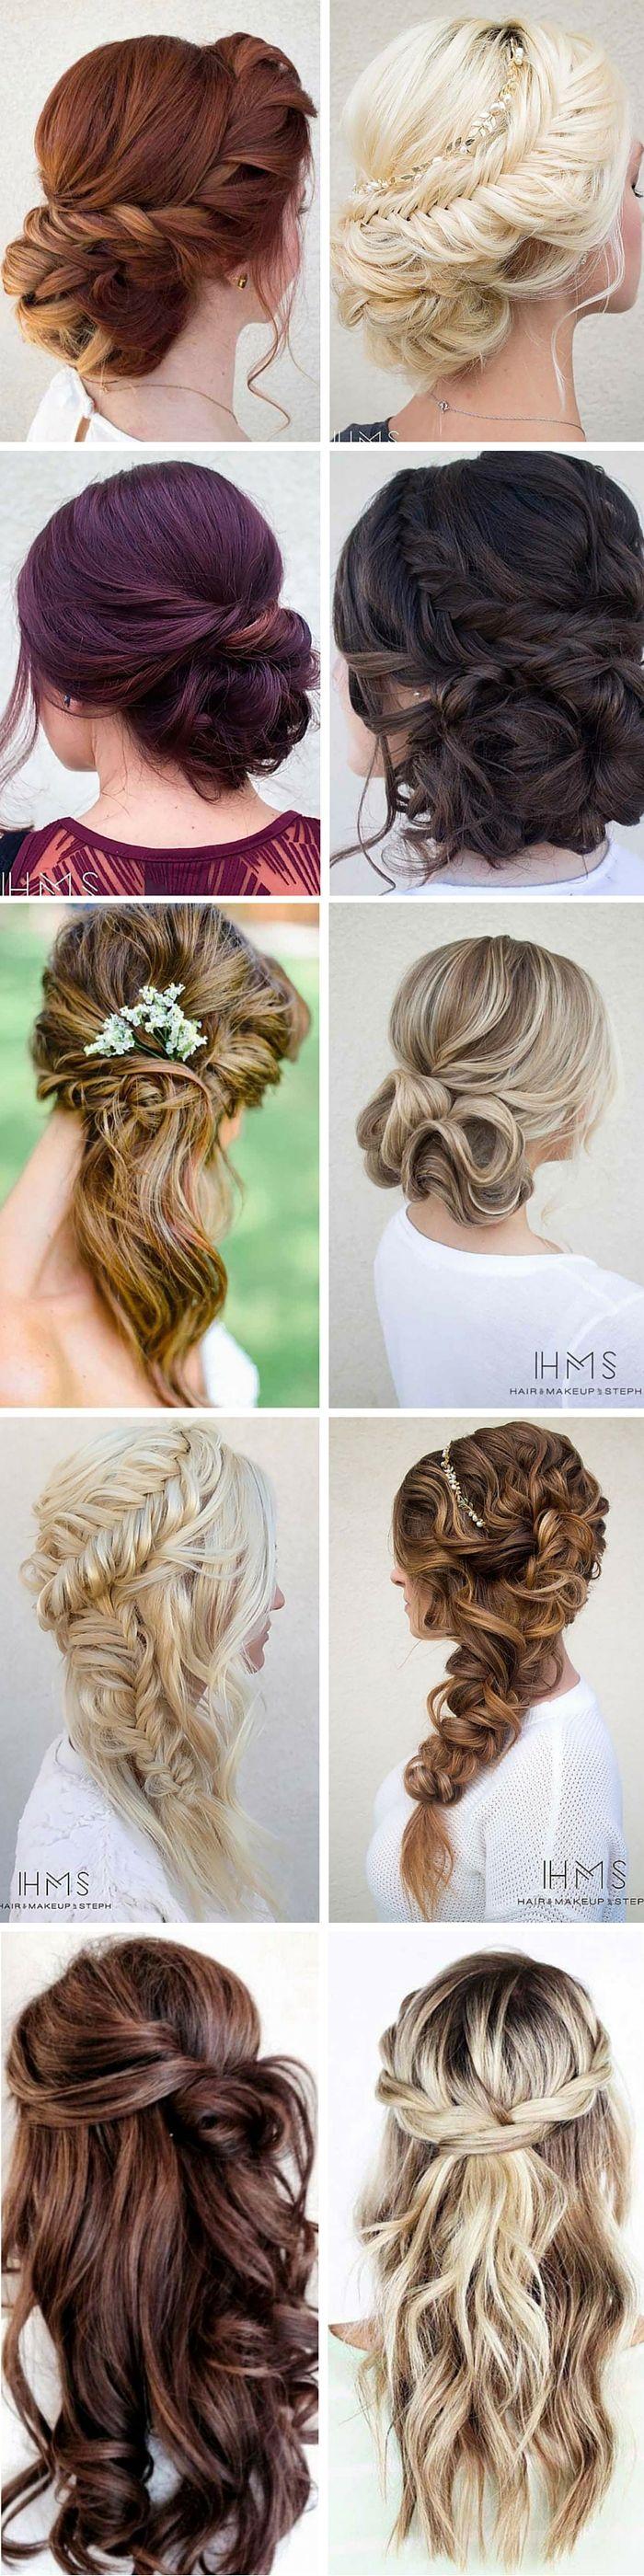 hottest bridesmaids hairstyles for short u long hair bridesmaid